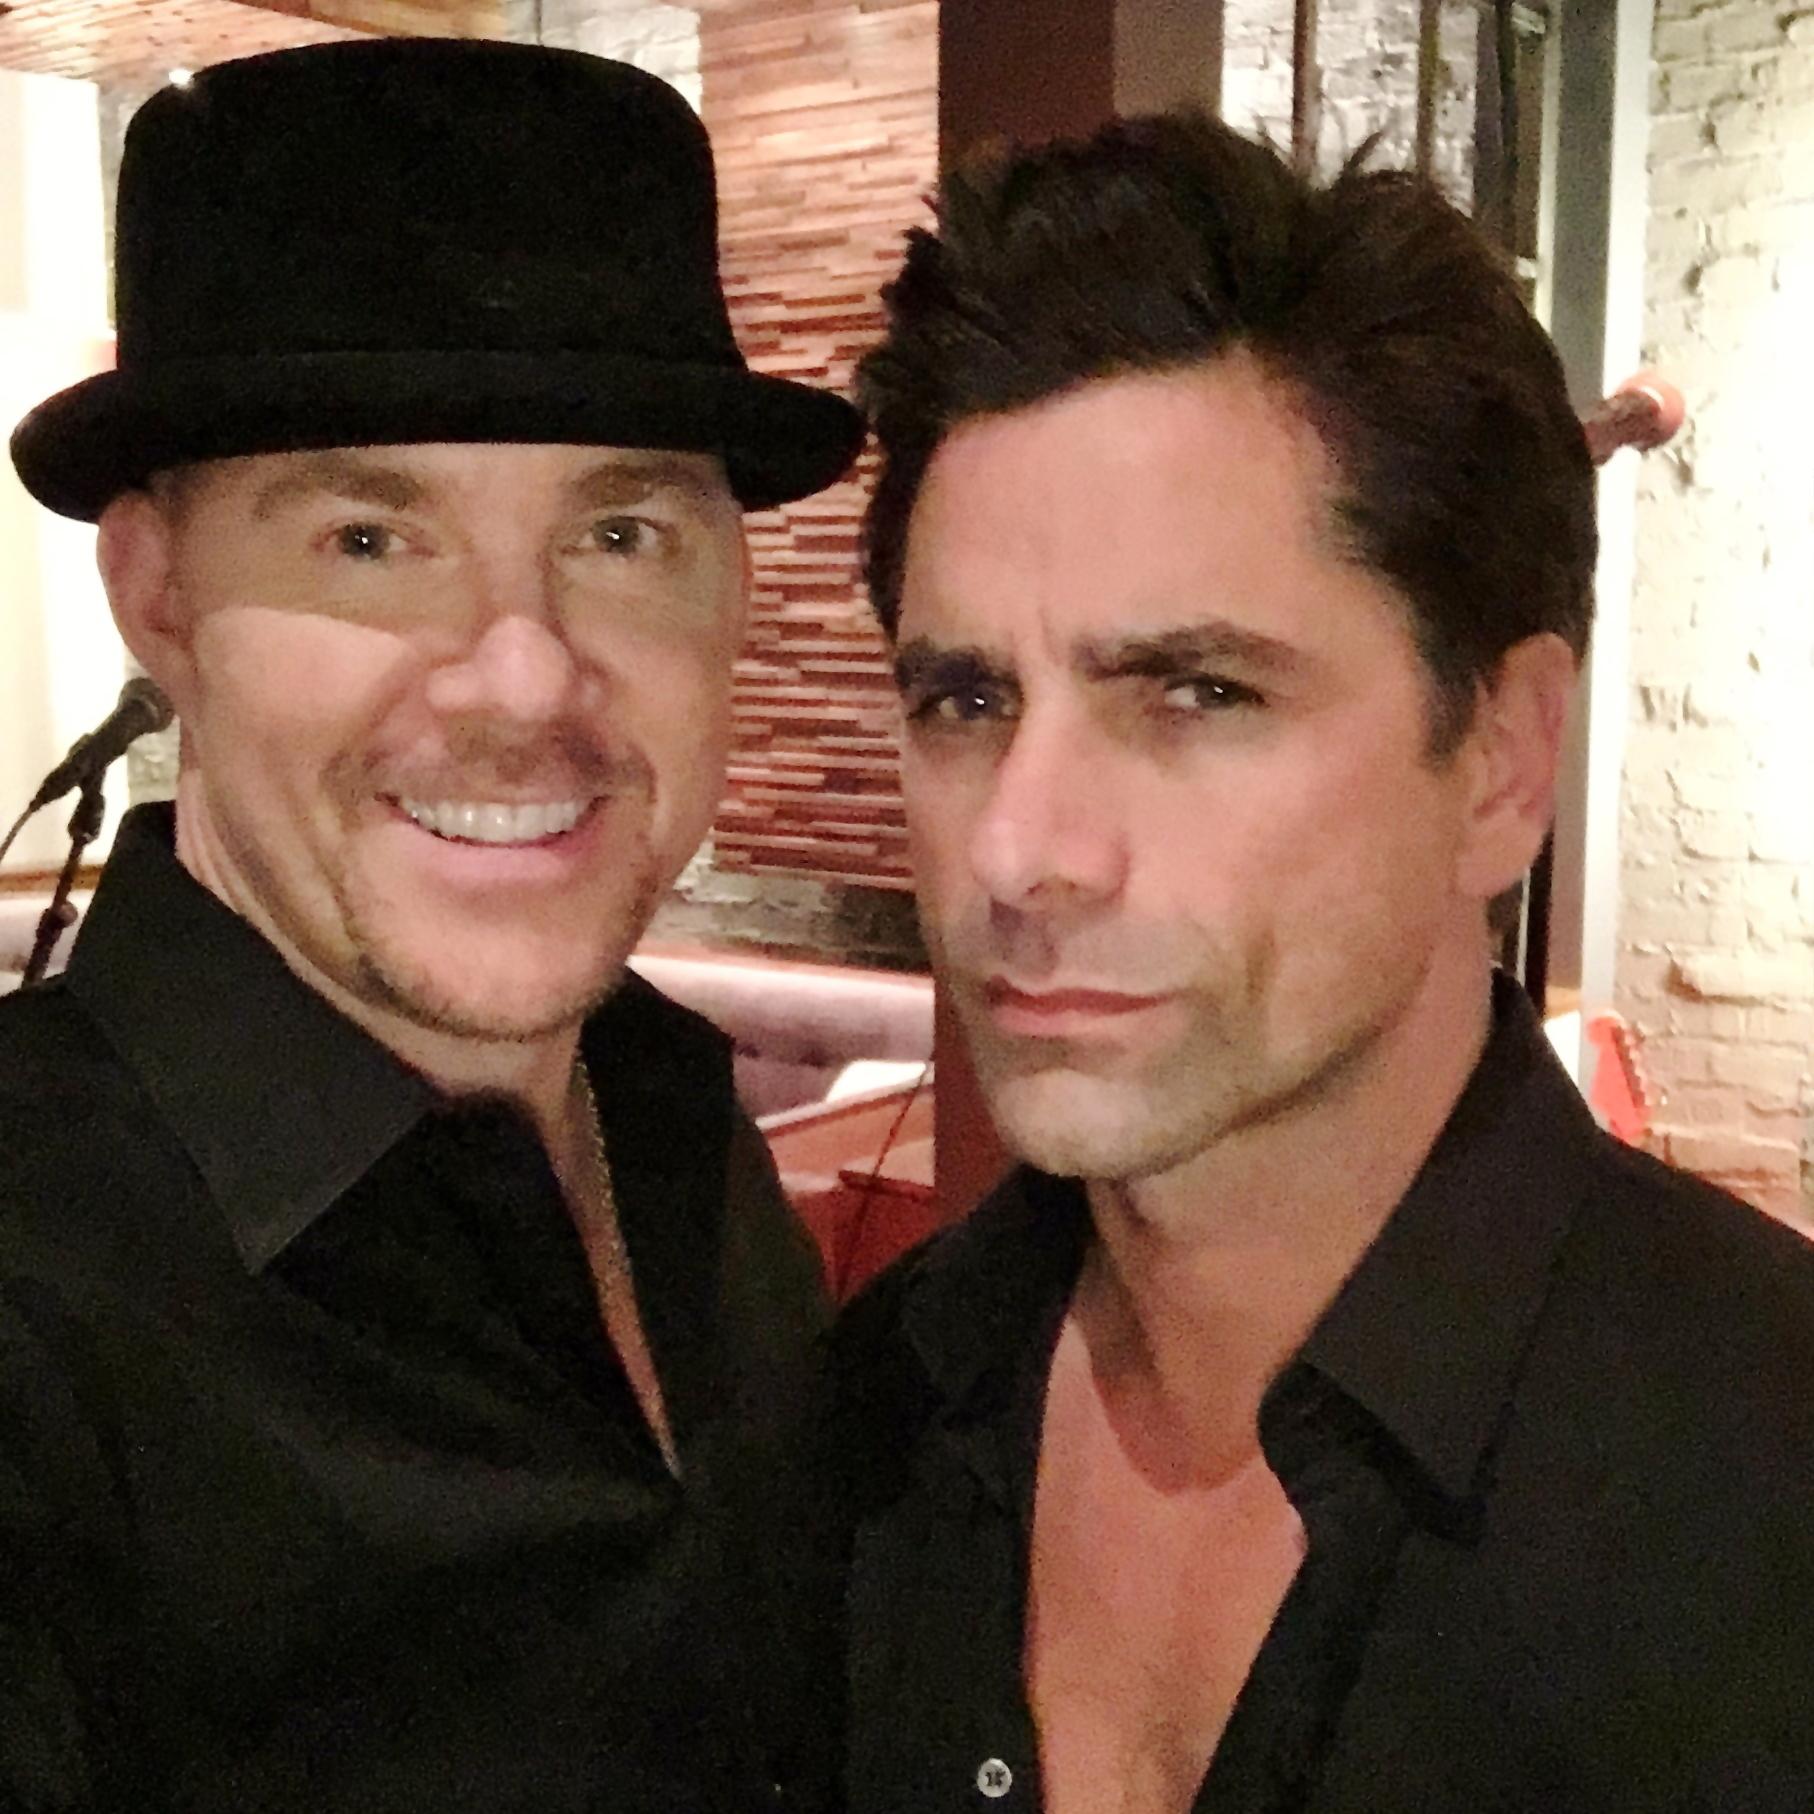 Todd with John Stamos